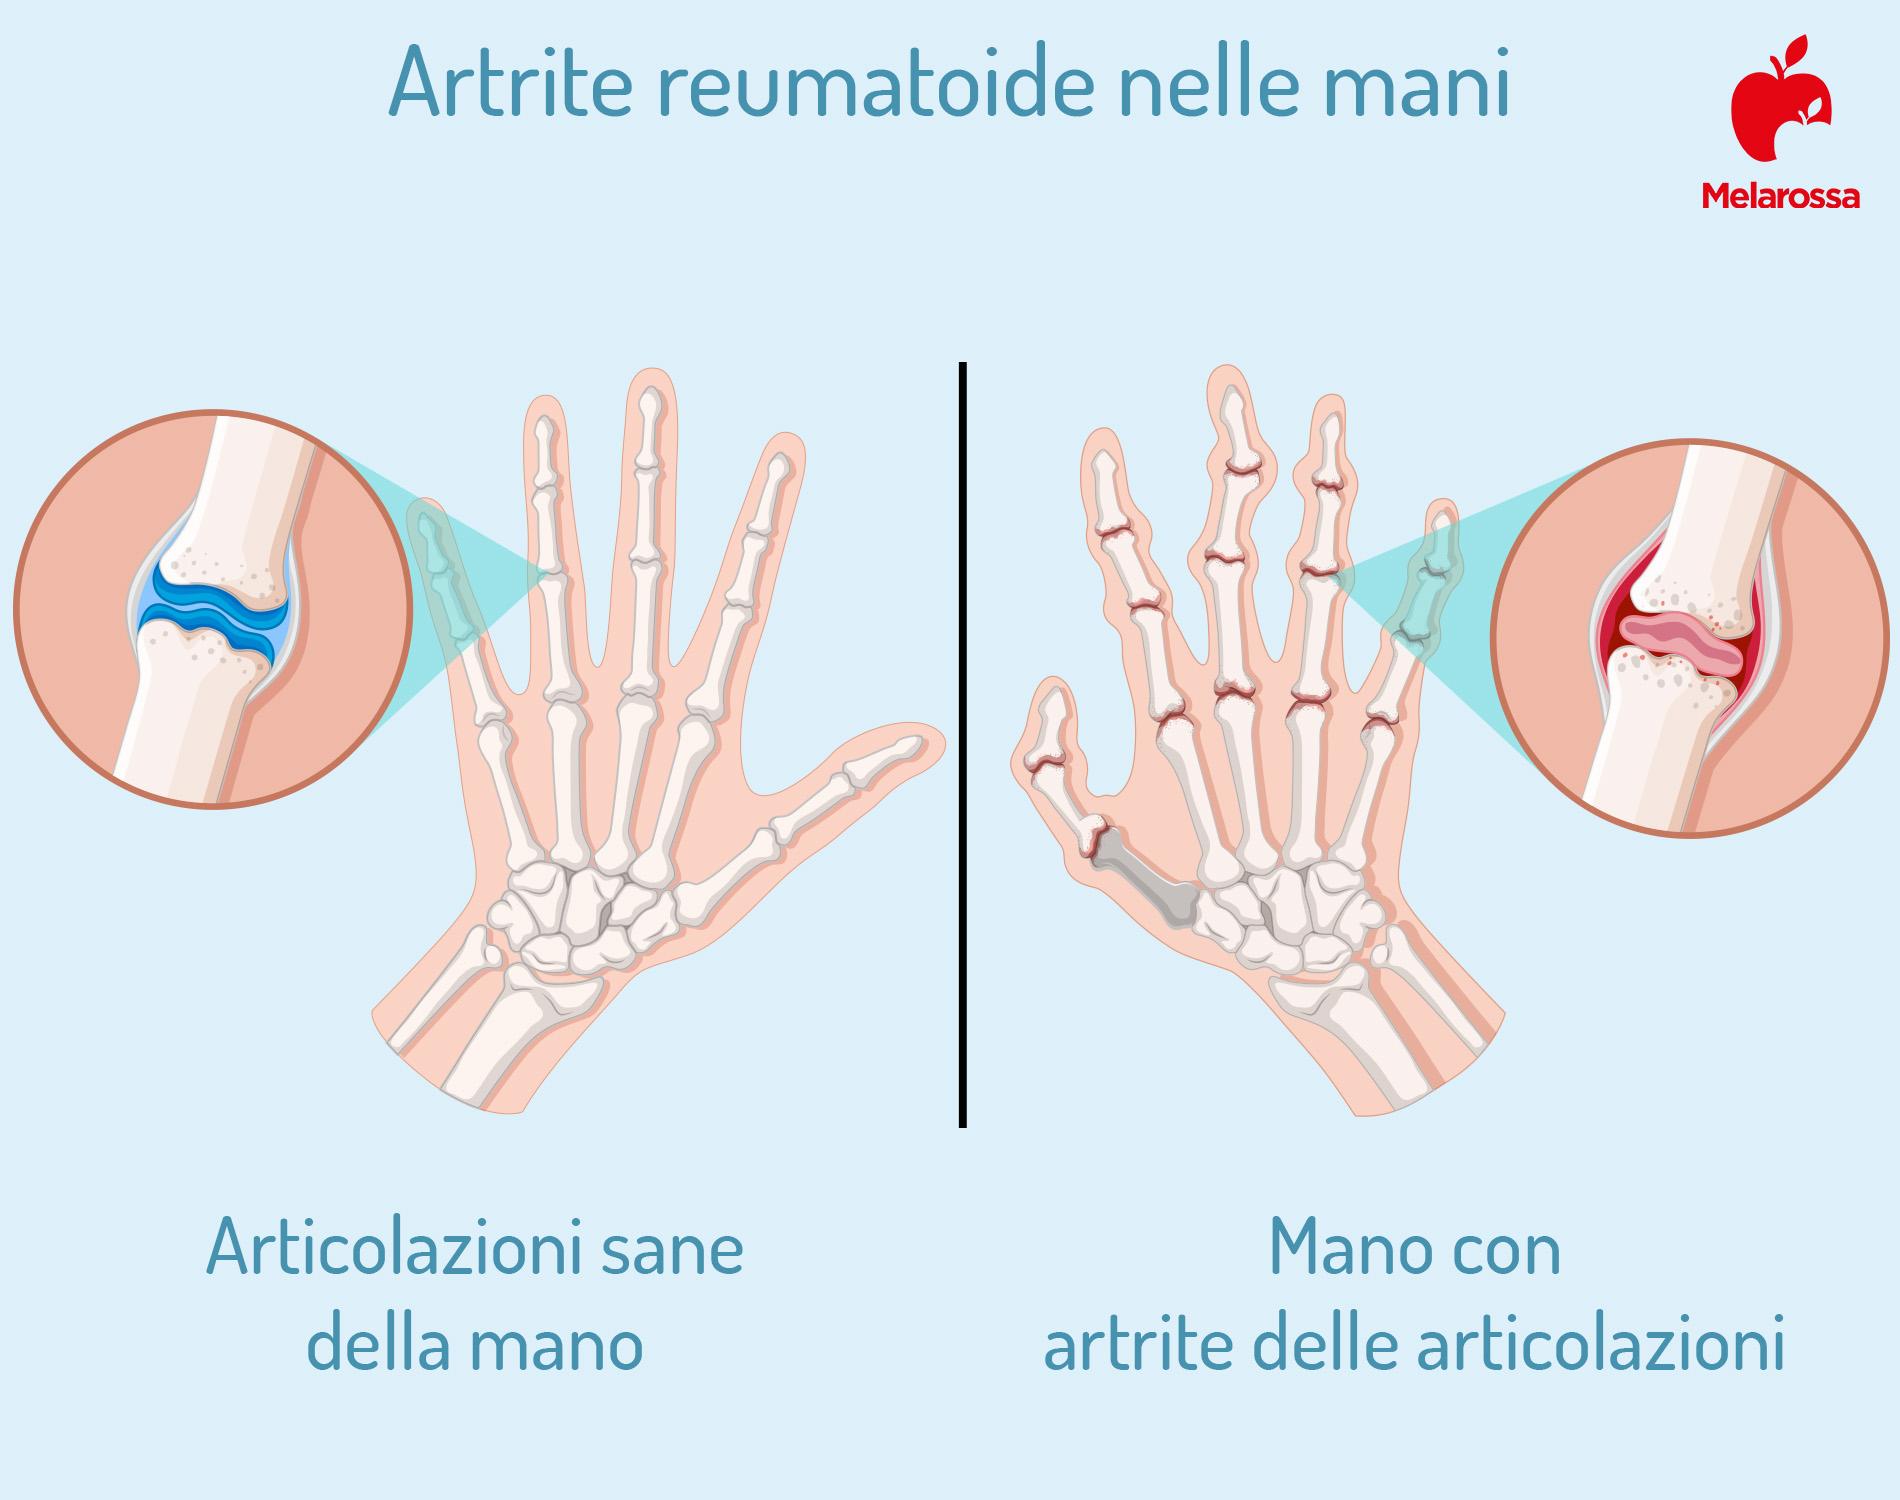 artrite reumatoide: mani